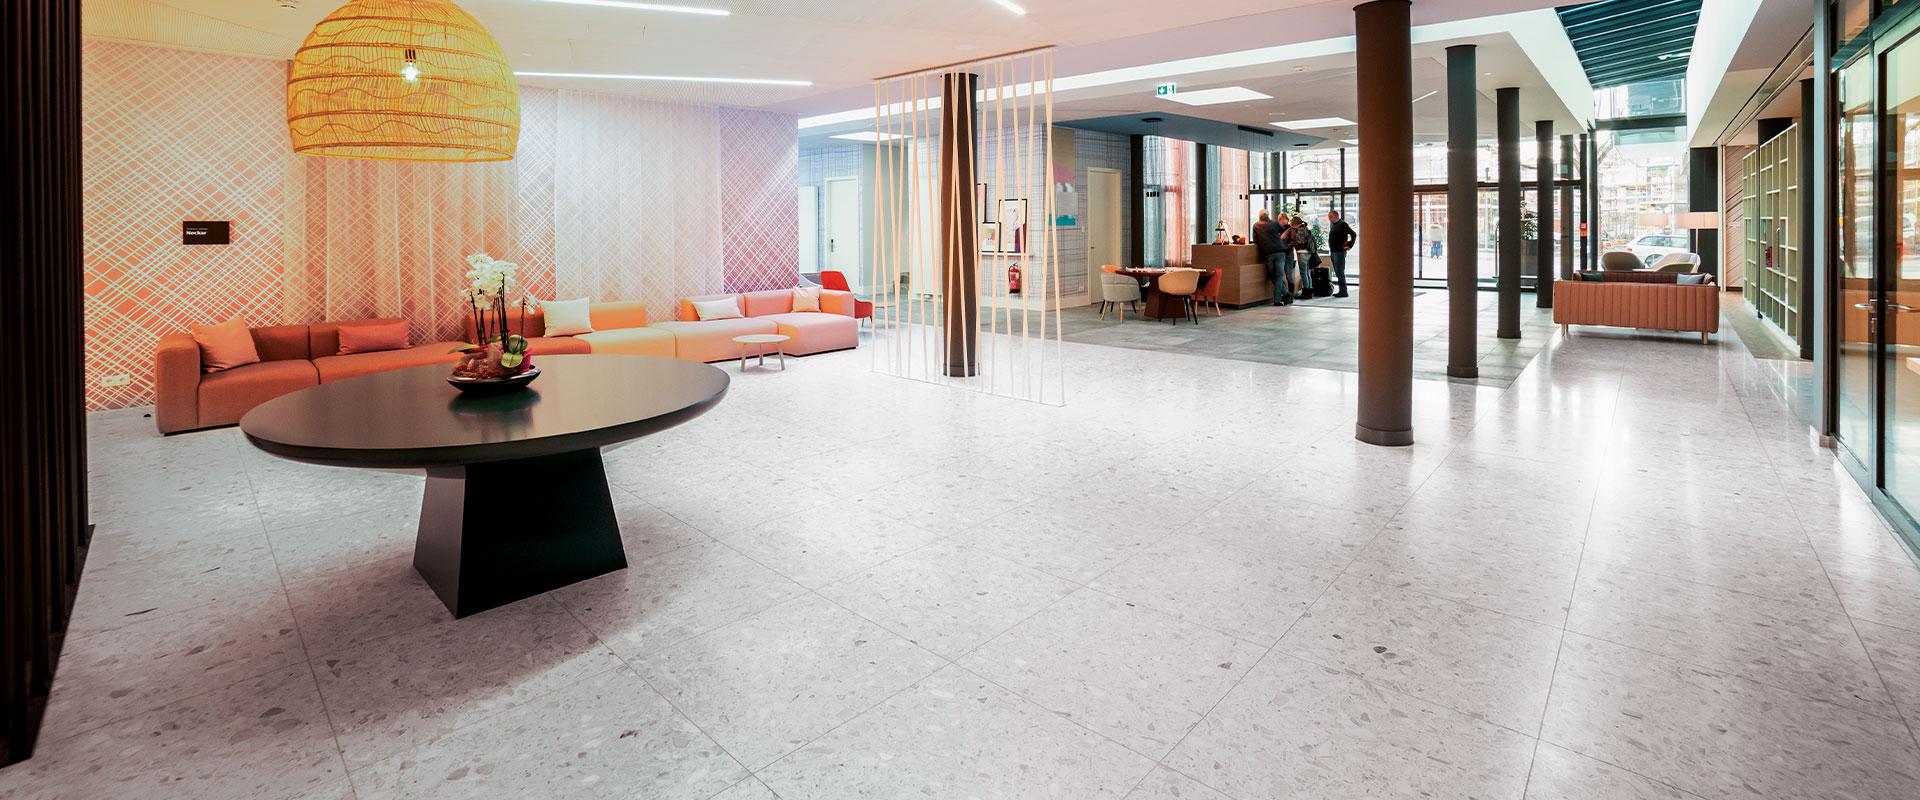 AGGLOTECH-progetto-Hotel-Salinengarten-slider-1